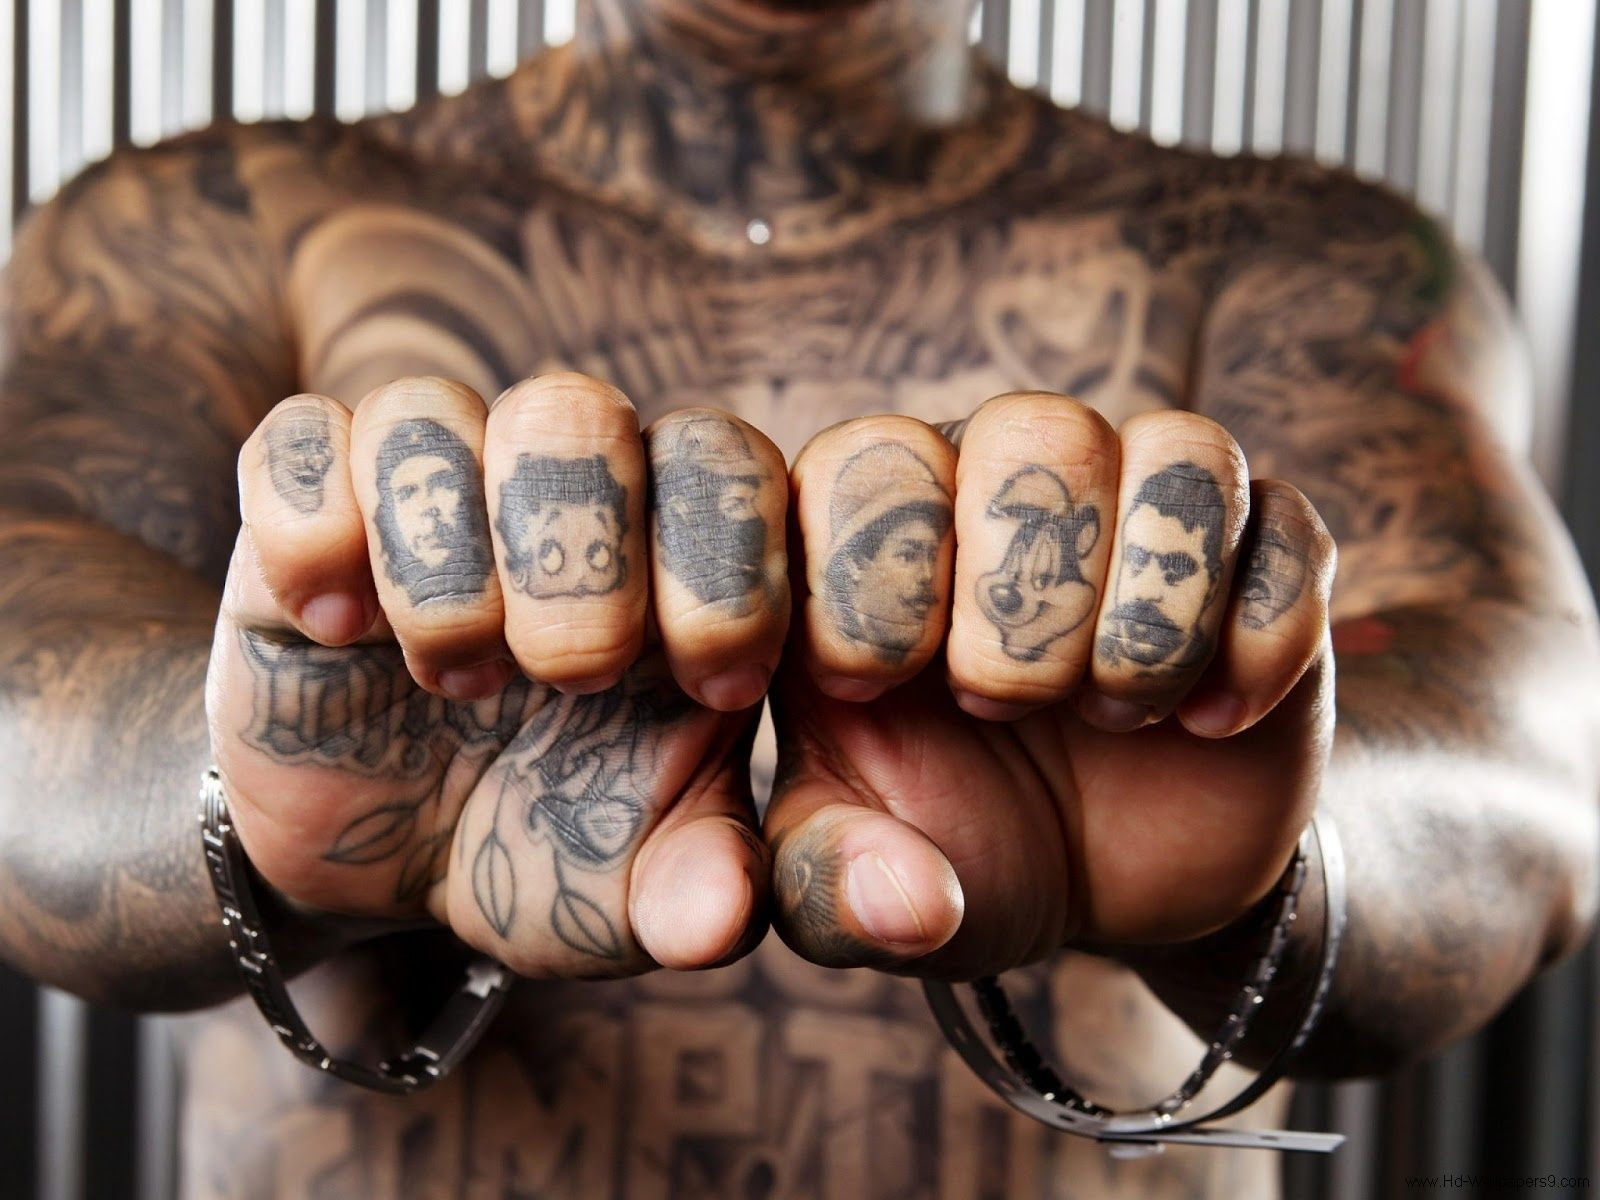 Download Tattoo Wallpaper Full Hd Hd Backgrounds Download